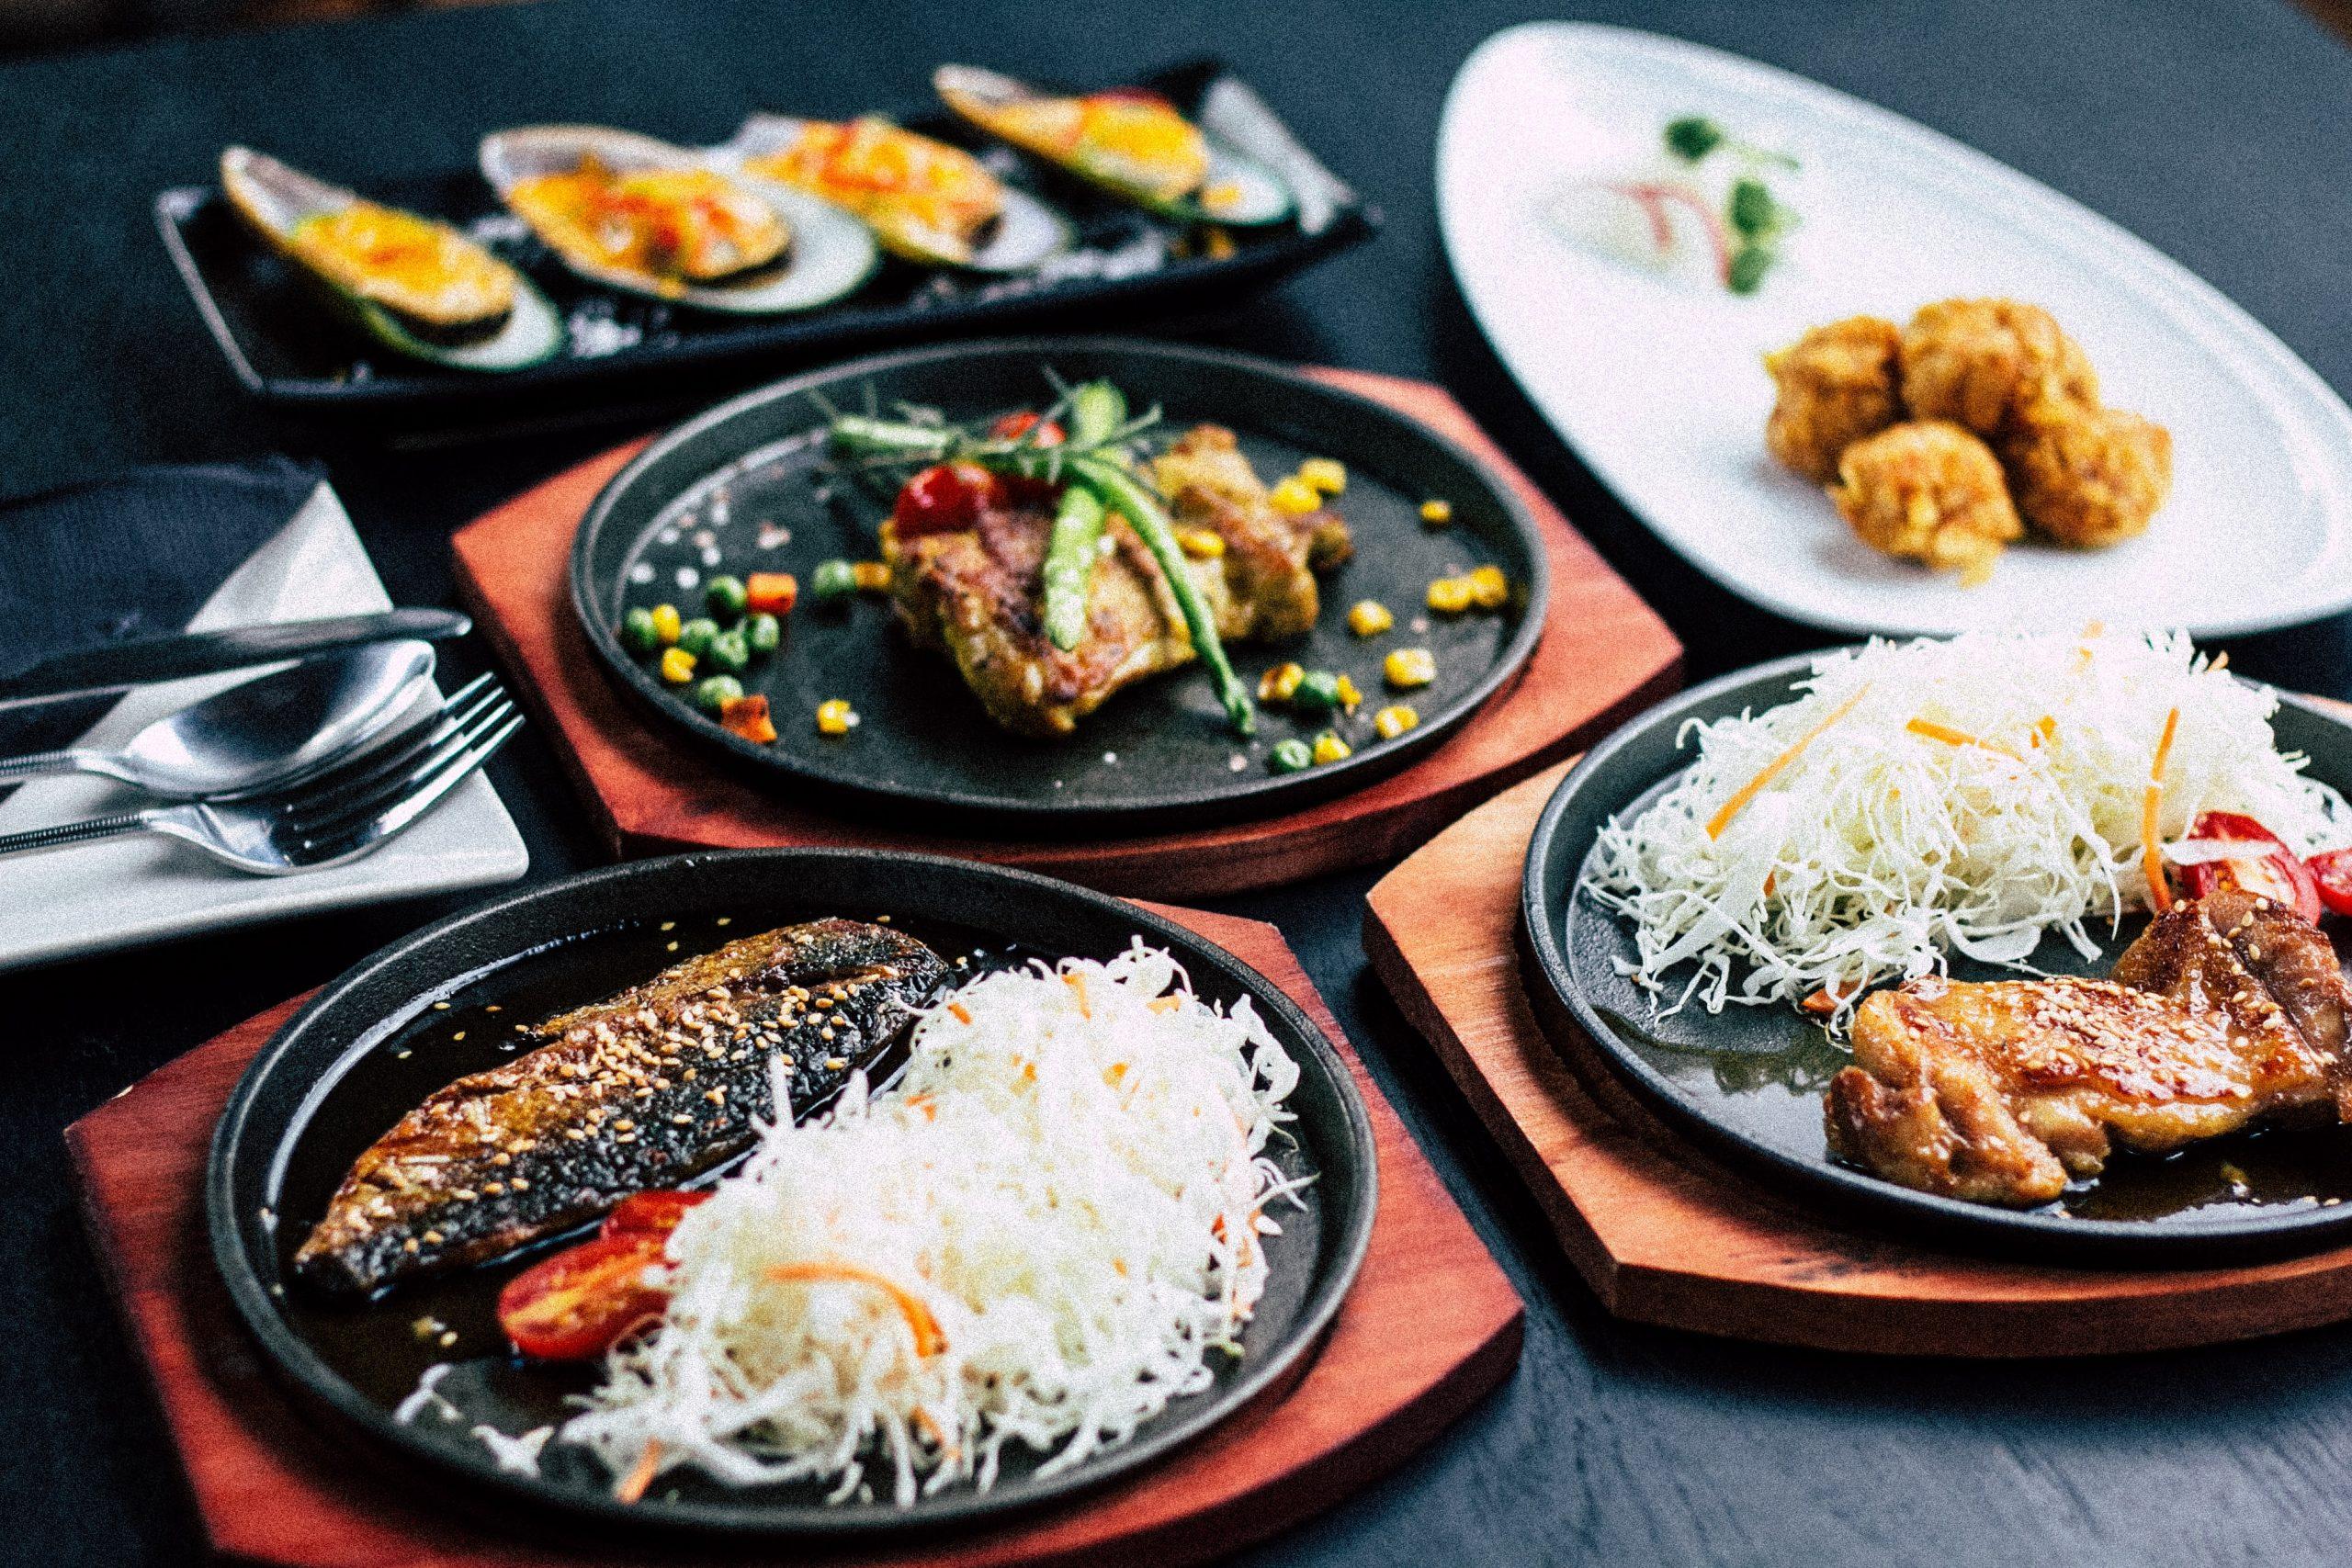 Digital-Marketing-For-Restaurants-scaled.jpeg